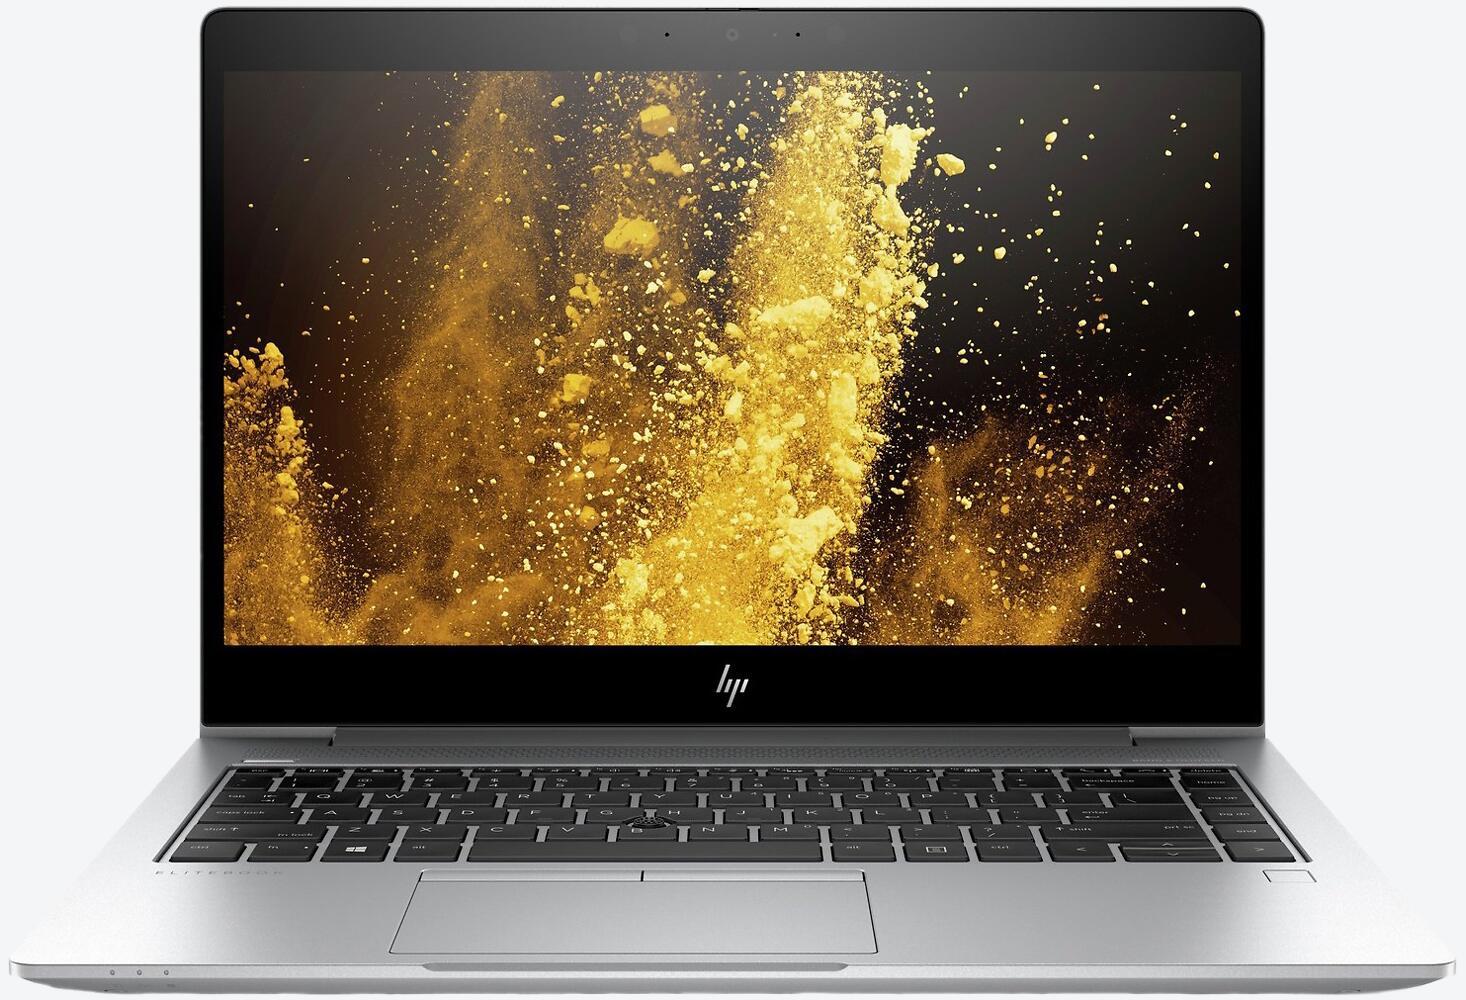 HP EliteBook 840 G6 (7KN30EA) LTE